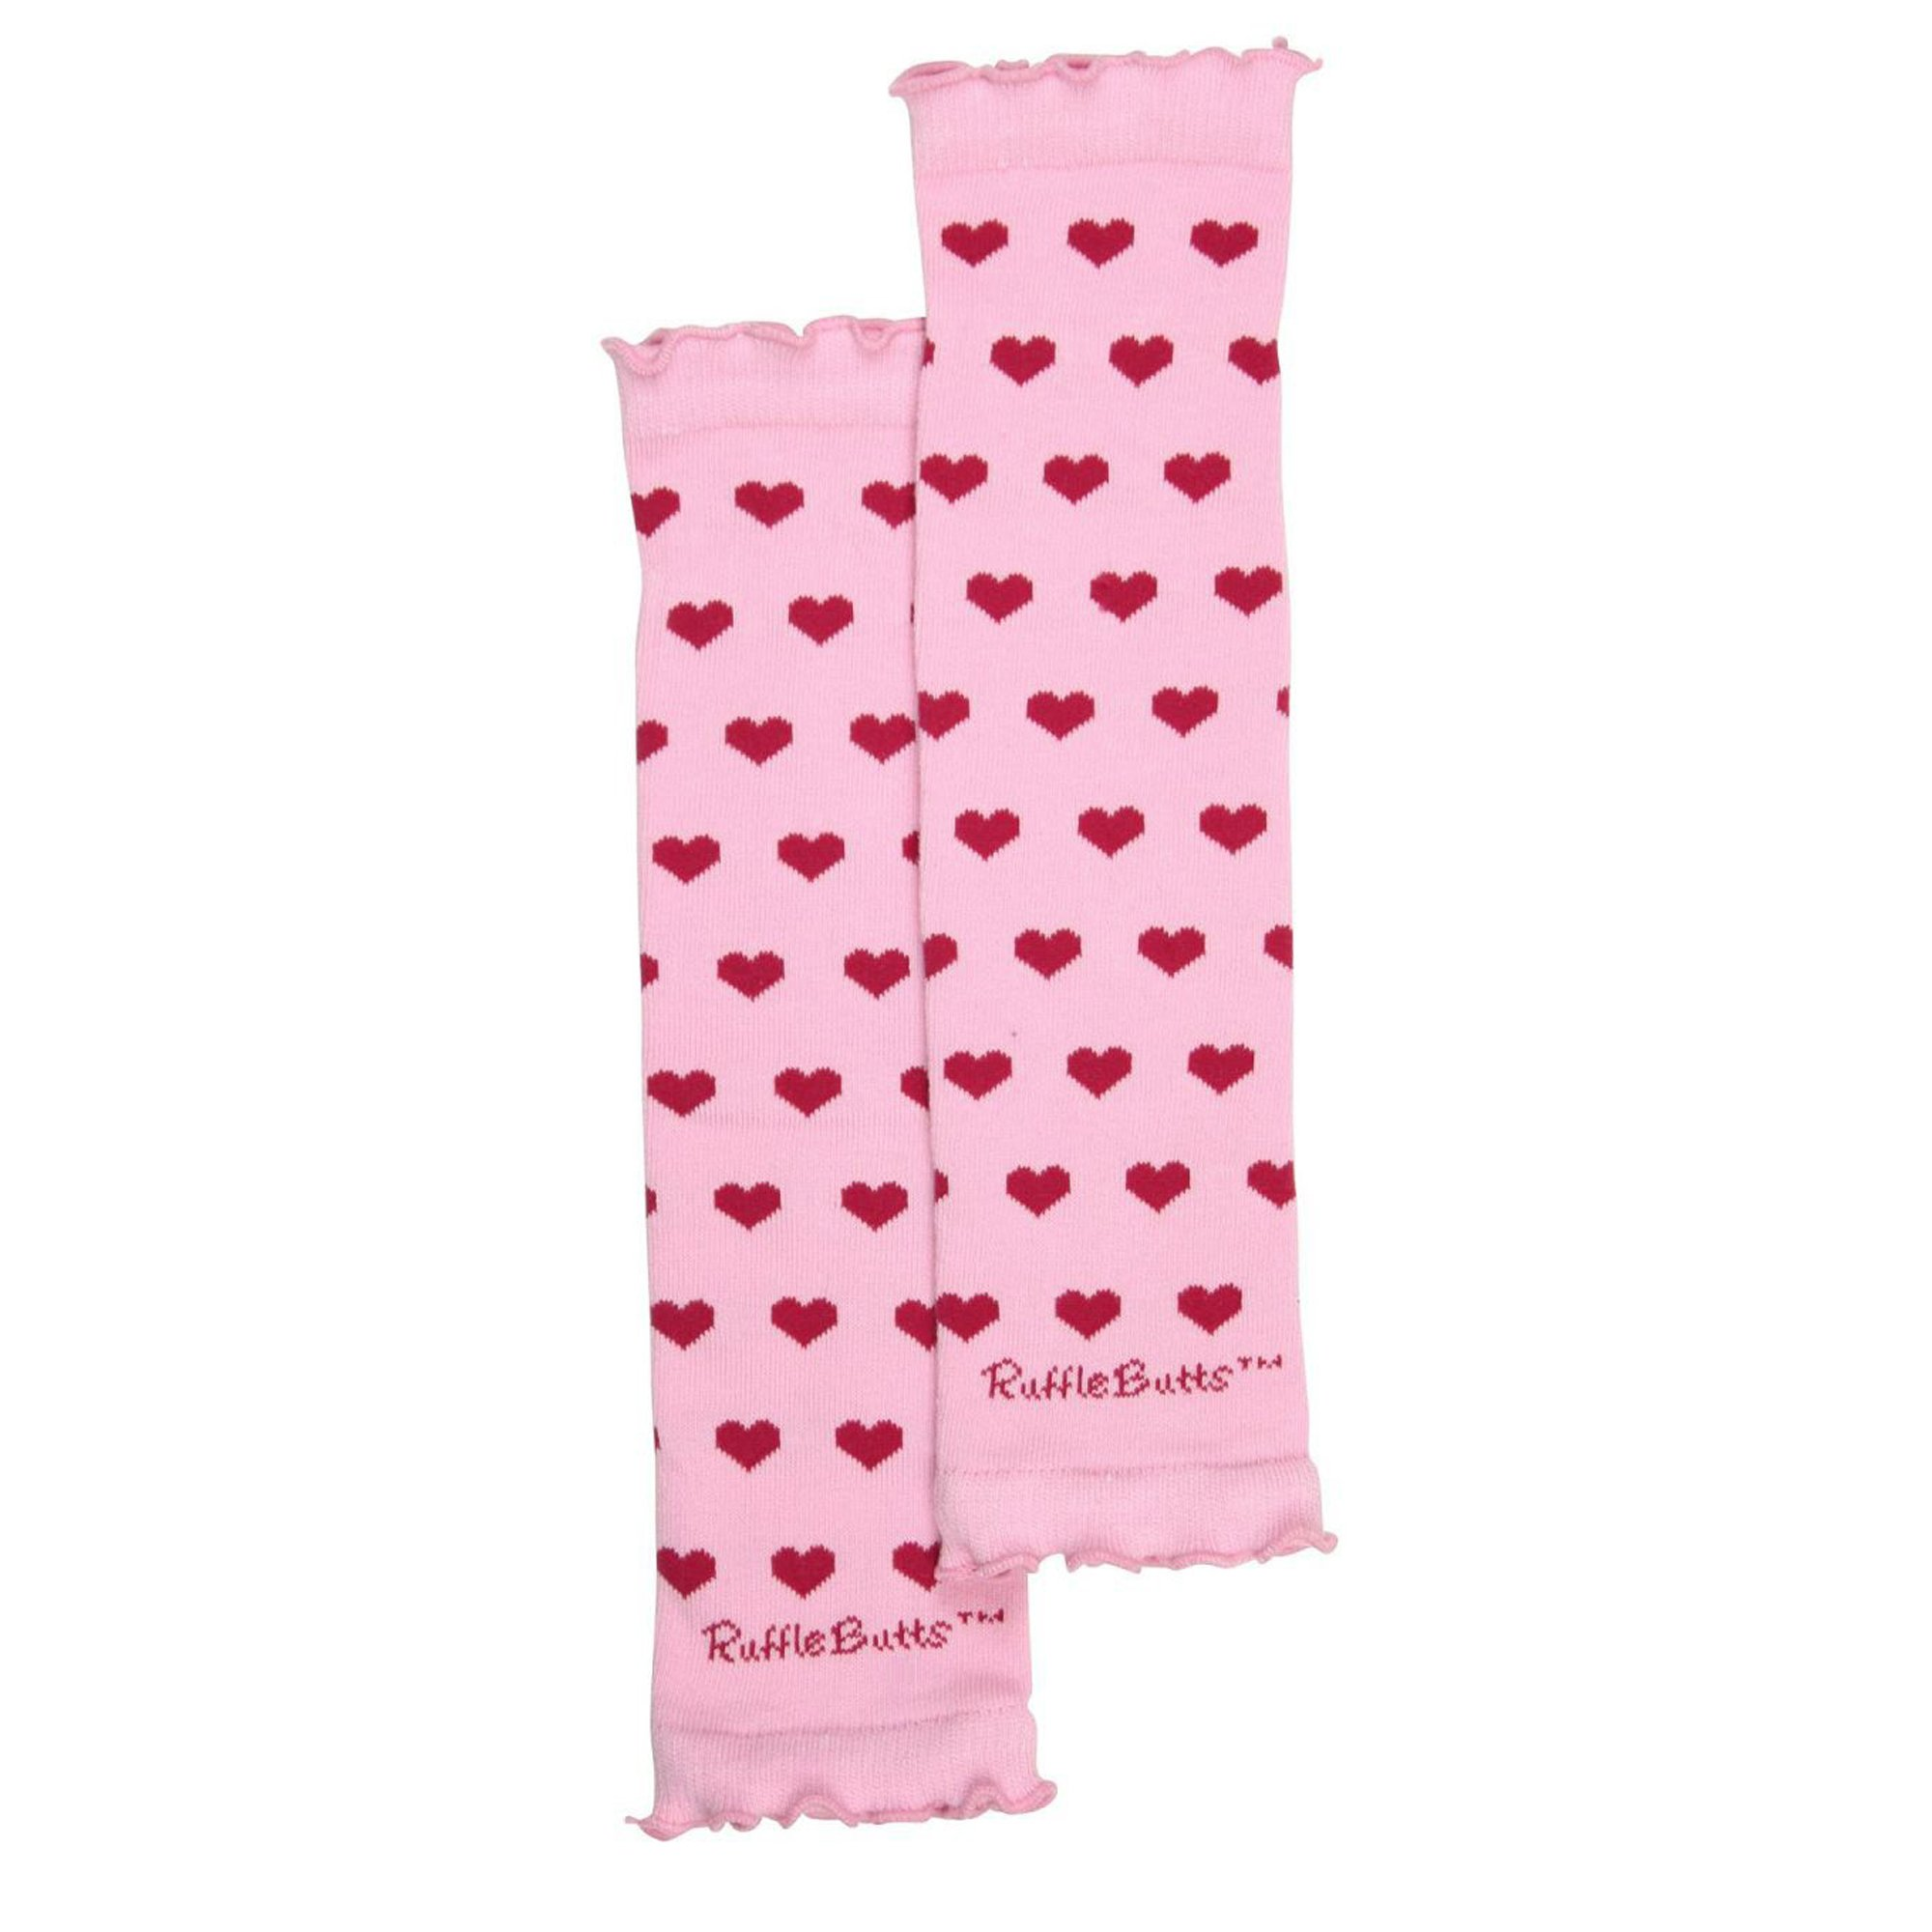 398b9781d217 Ruffle Butts Pink with Fuchsia Hearts Leg Warmers